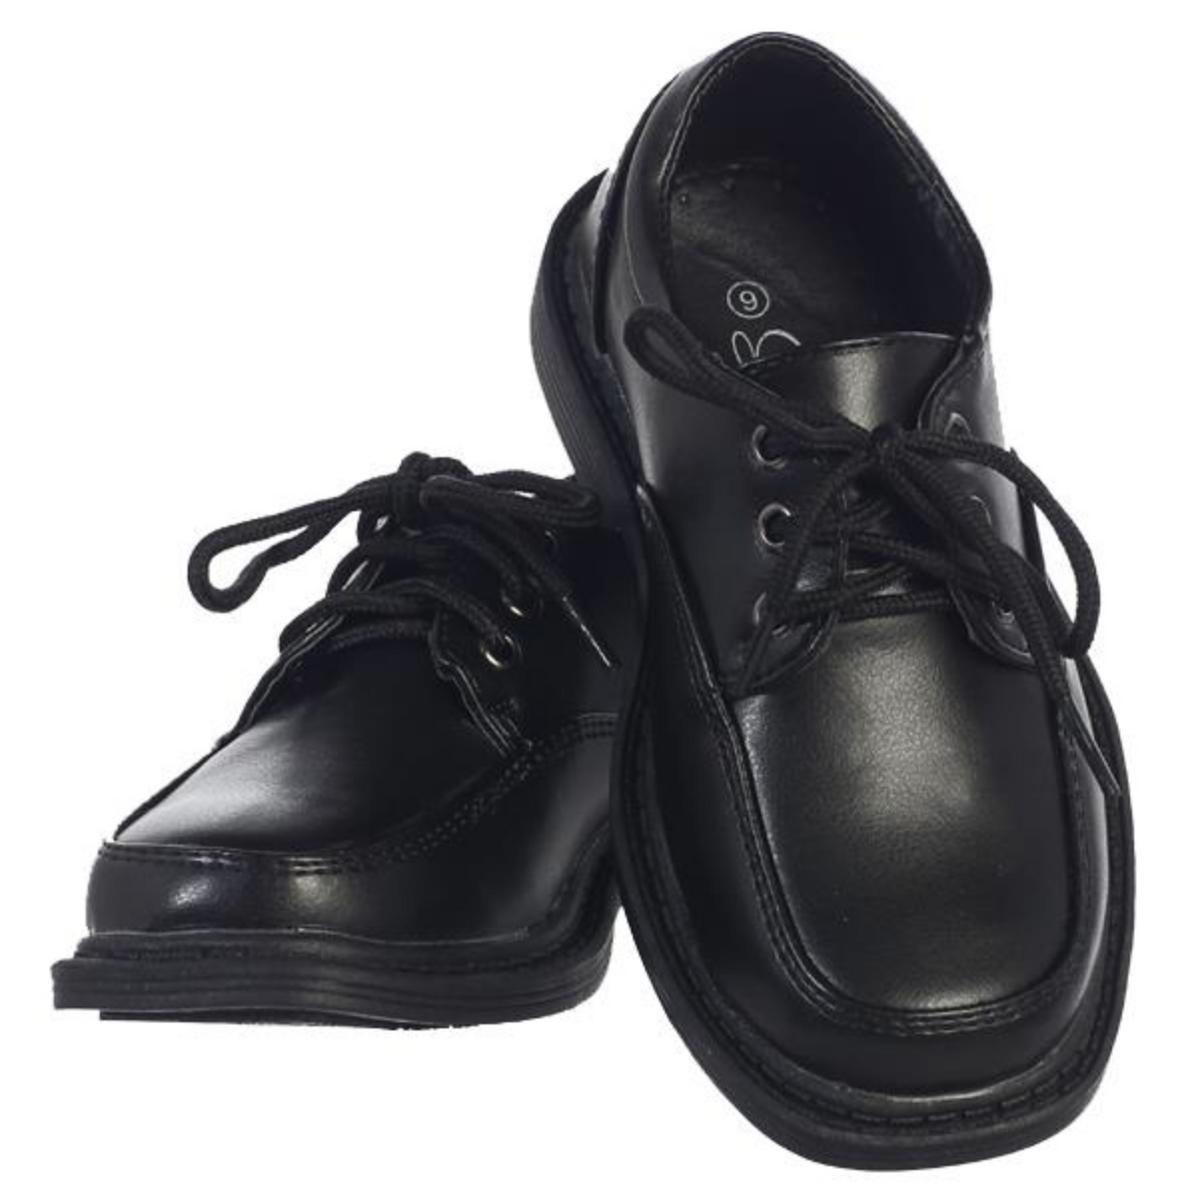 Boys Black Lace-up Formal Shoes